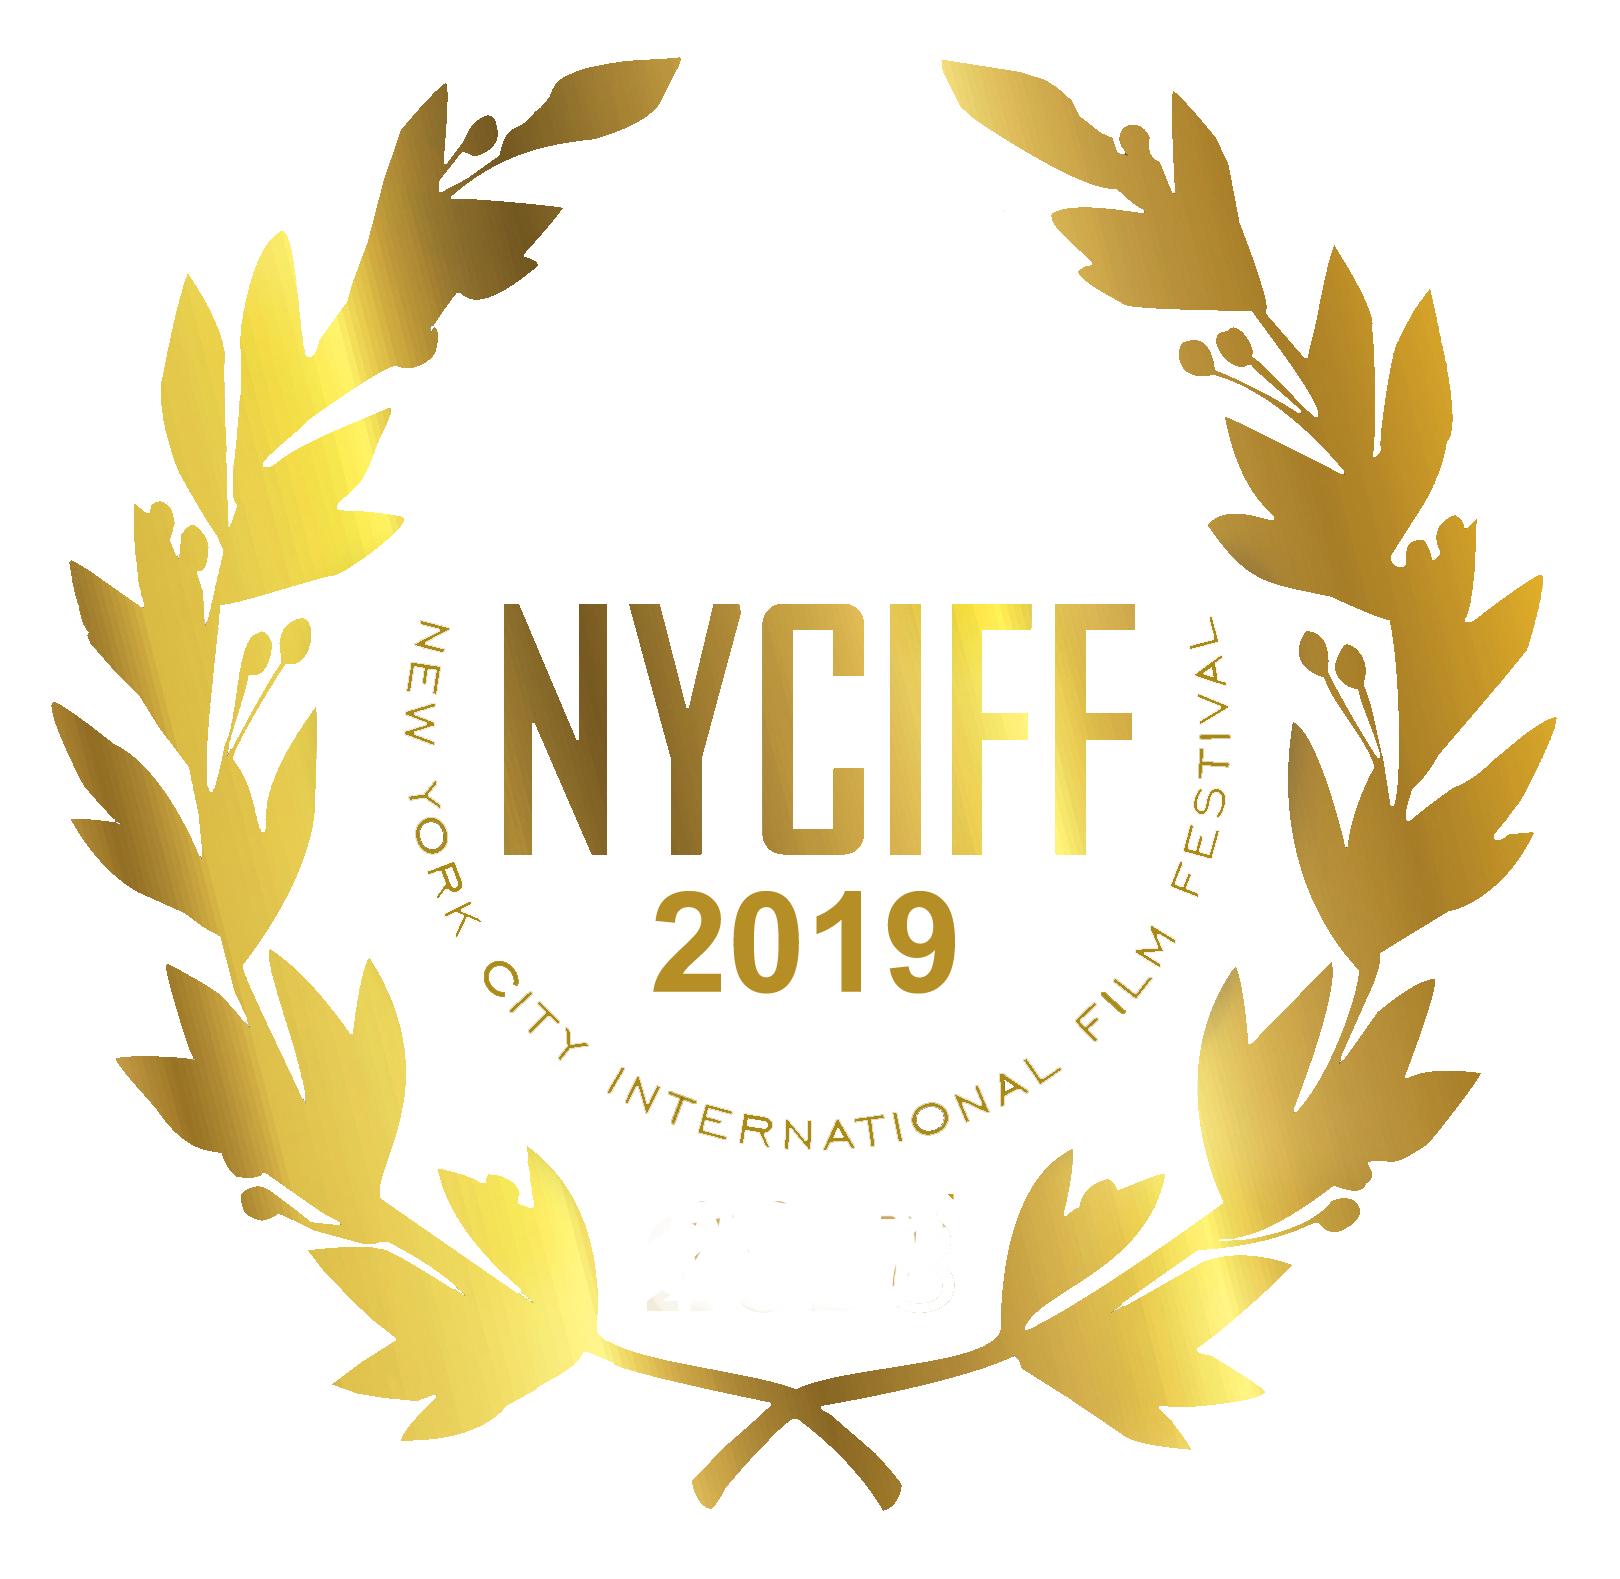 NYCIFF TRANPARENTNO DATE  4 FB png copy 2 copy 2.jpg